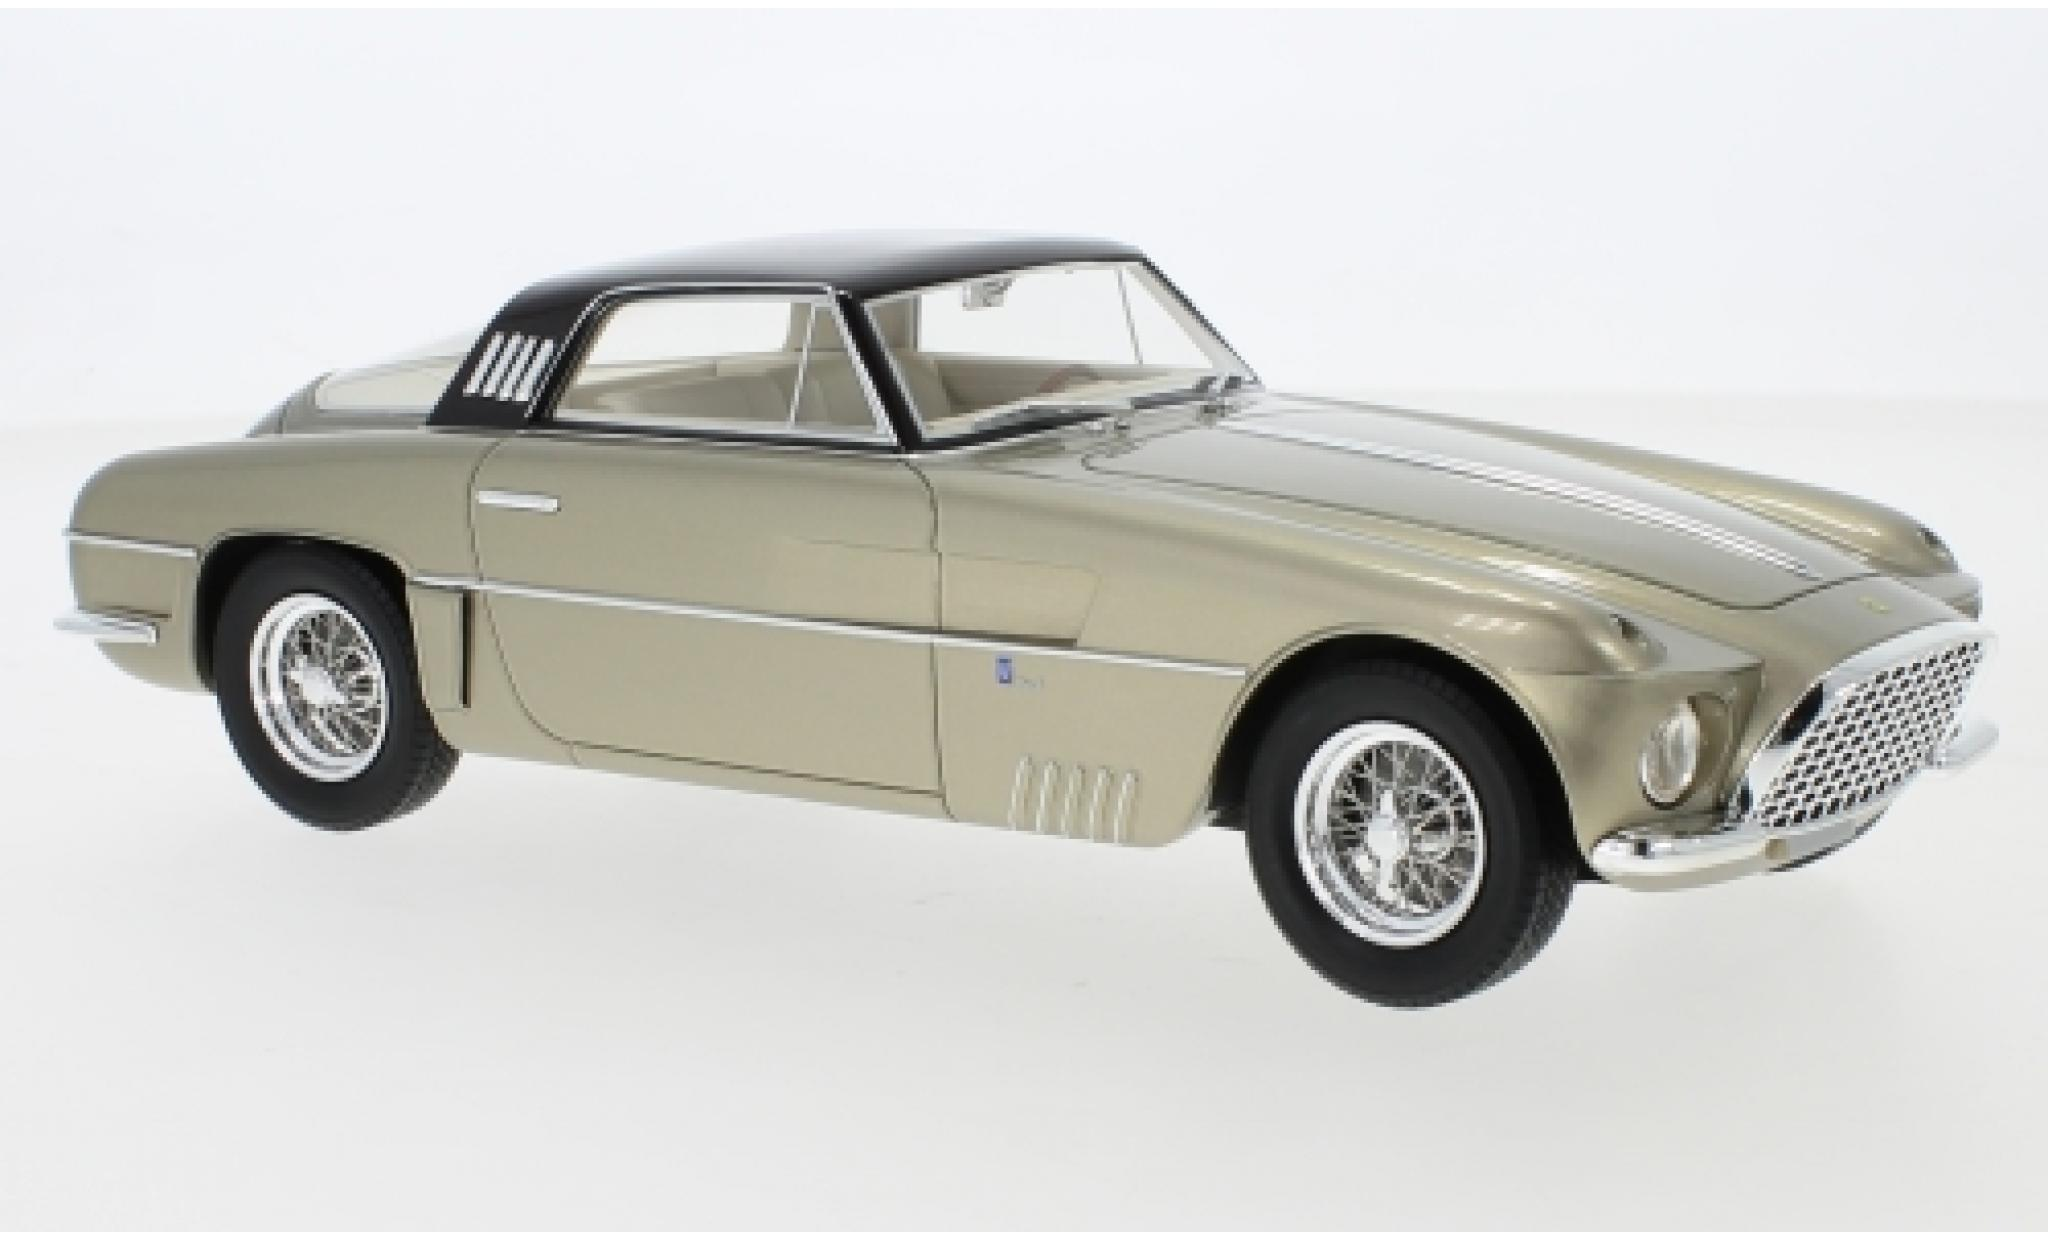 Ferrari 250 1/18 CMF Europa Coupe by Vignale metallise beige/black 1953